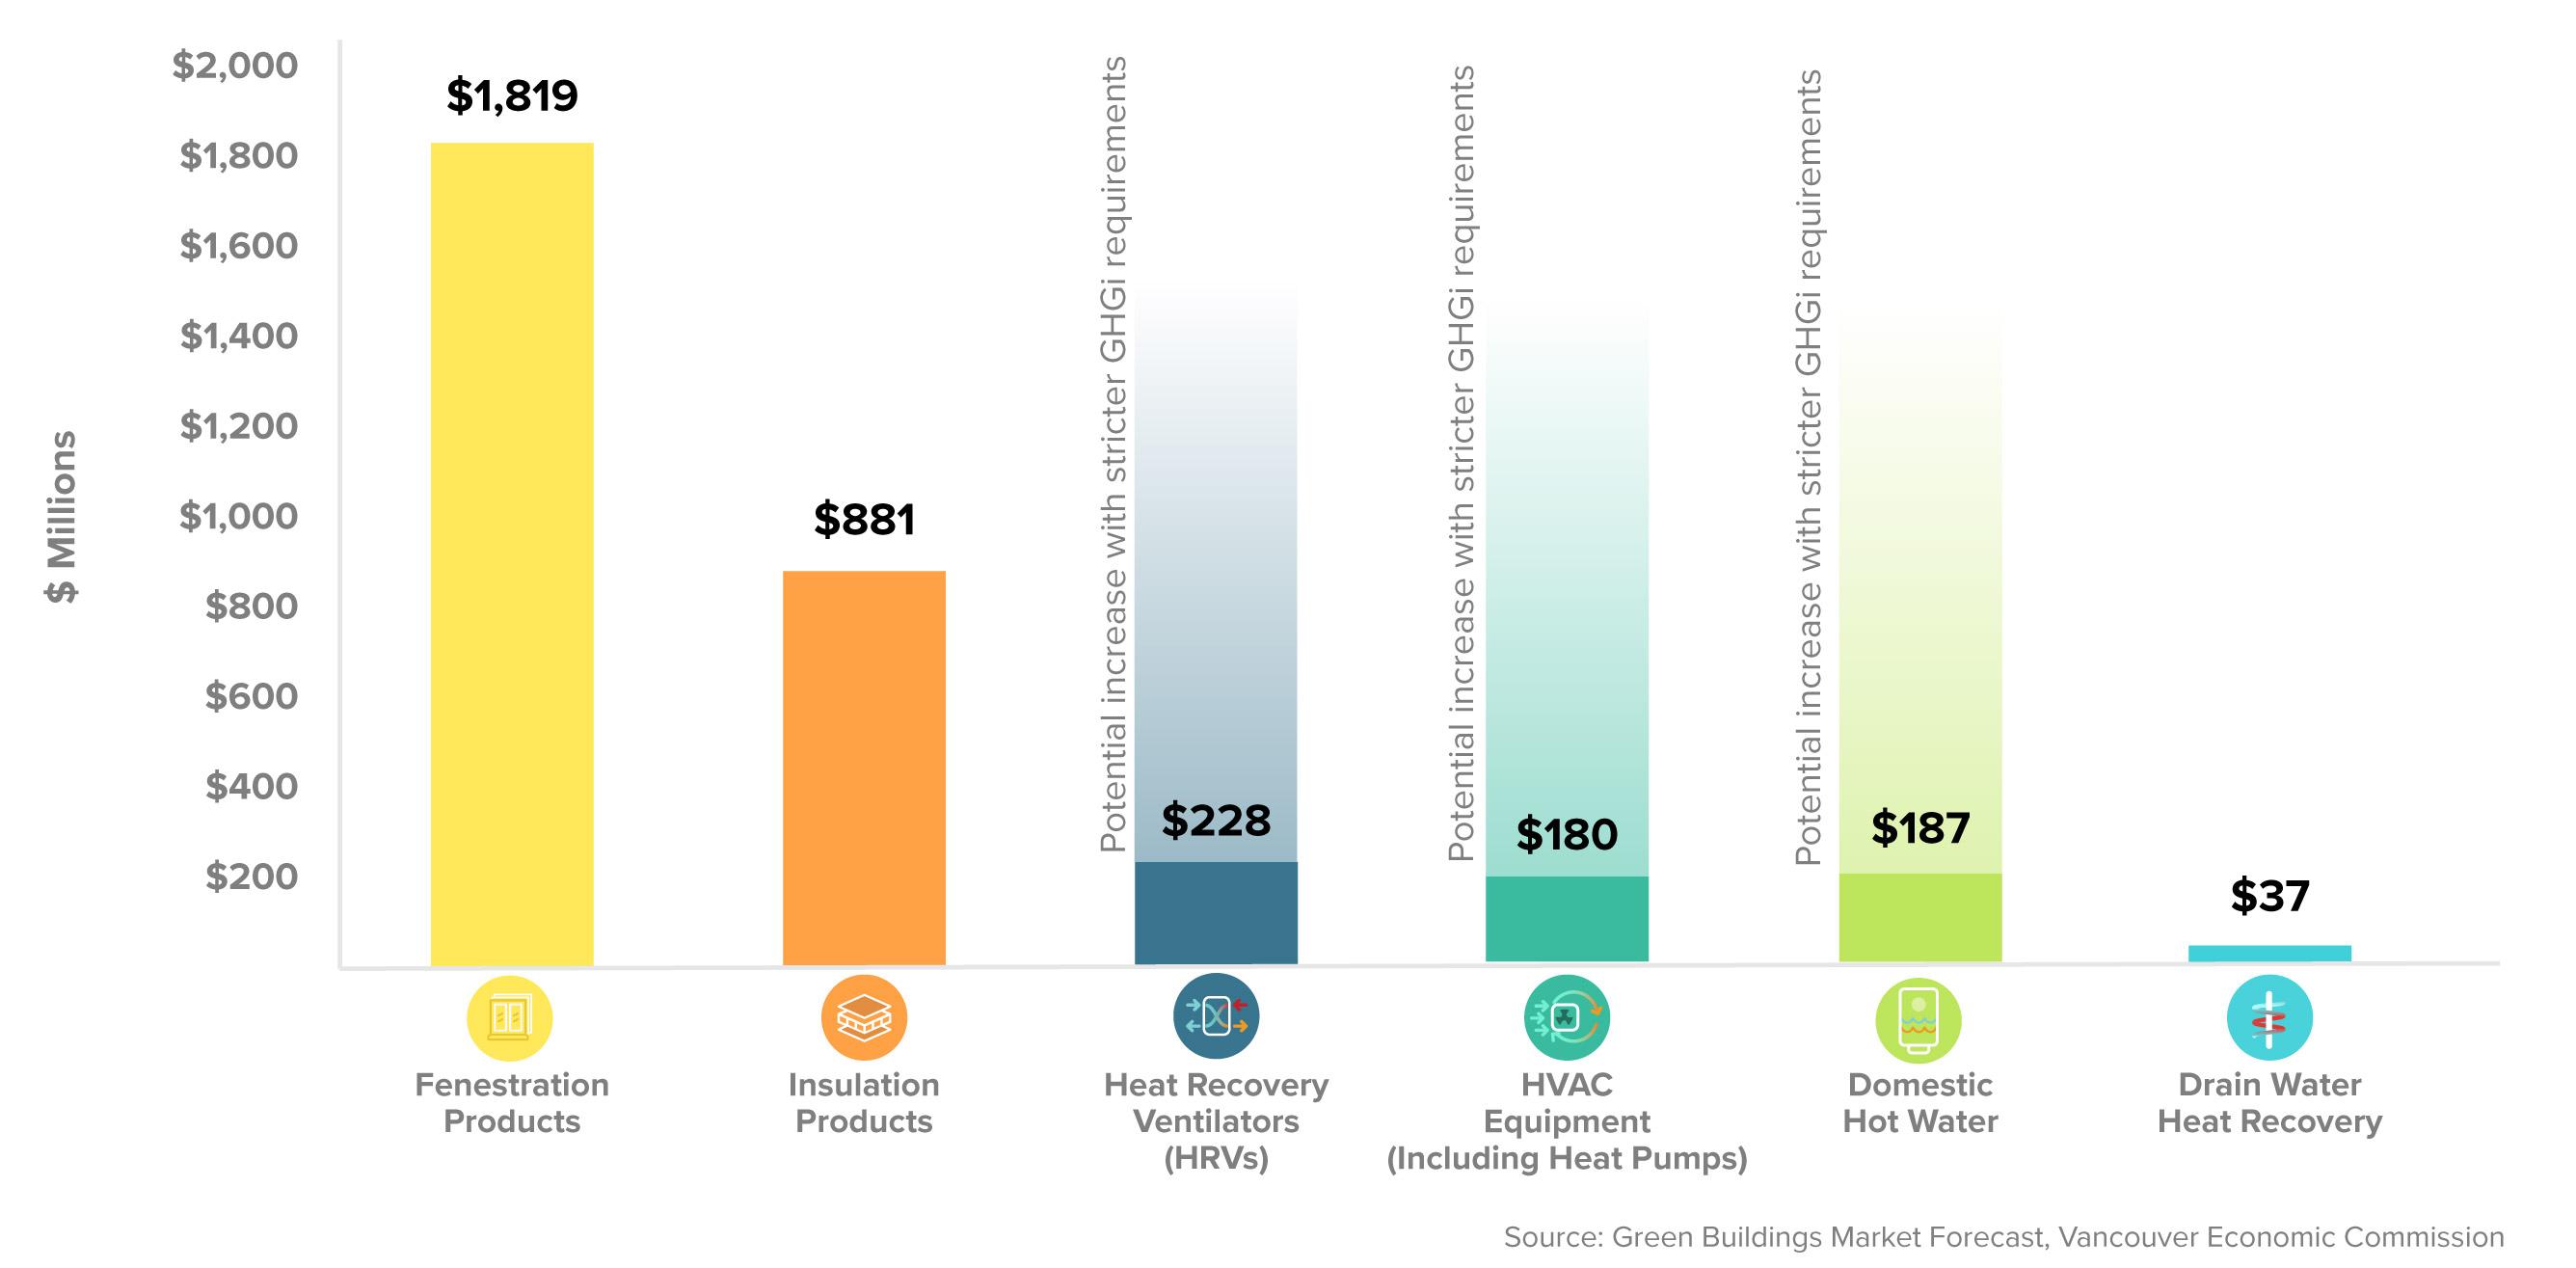 Demand for Building Products Metro Vancouver, New Construction, 2019–2032 Forecast (cumulative) | Vancouver Economic Commission 2019